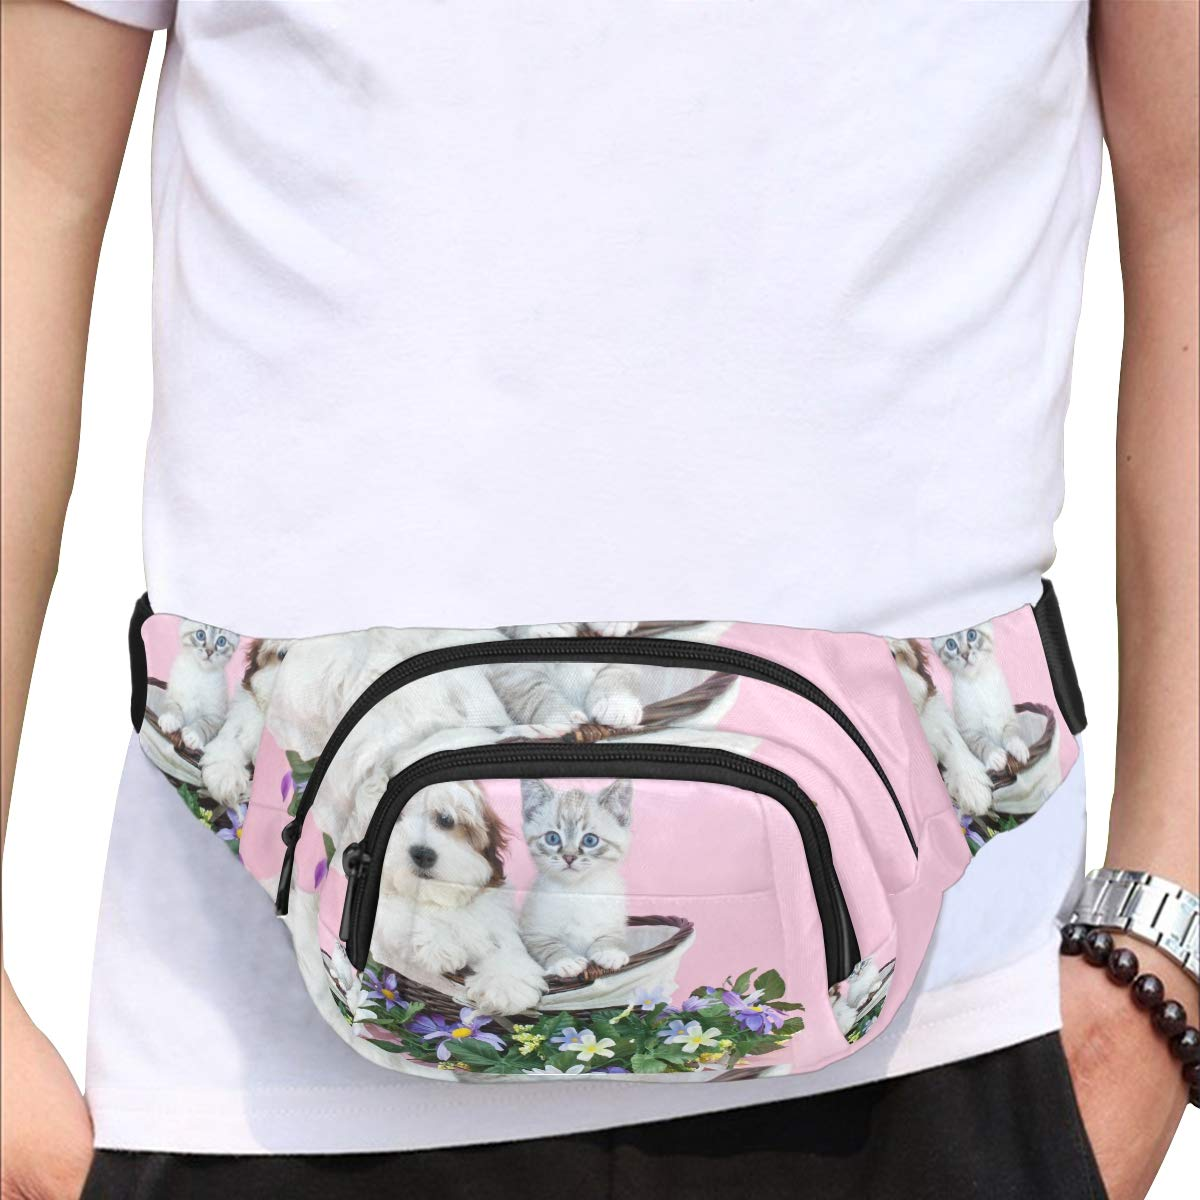 Cute Puppy In The Basket Fenny Packs Waist Bags Adjustable Belt Waterproof Nylon Travel Running Sport Vacation Party For Men Women Boys Girls Kids